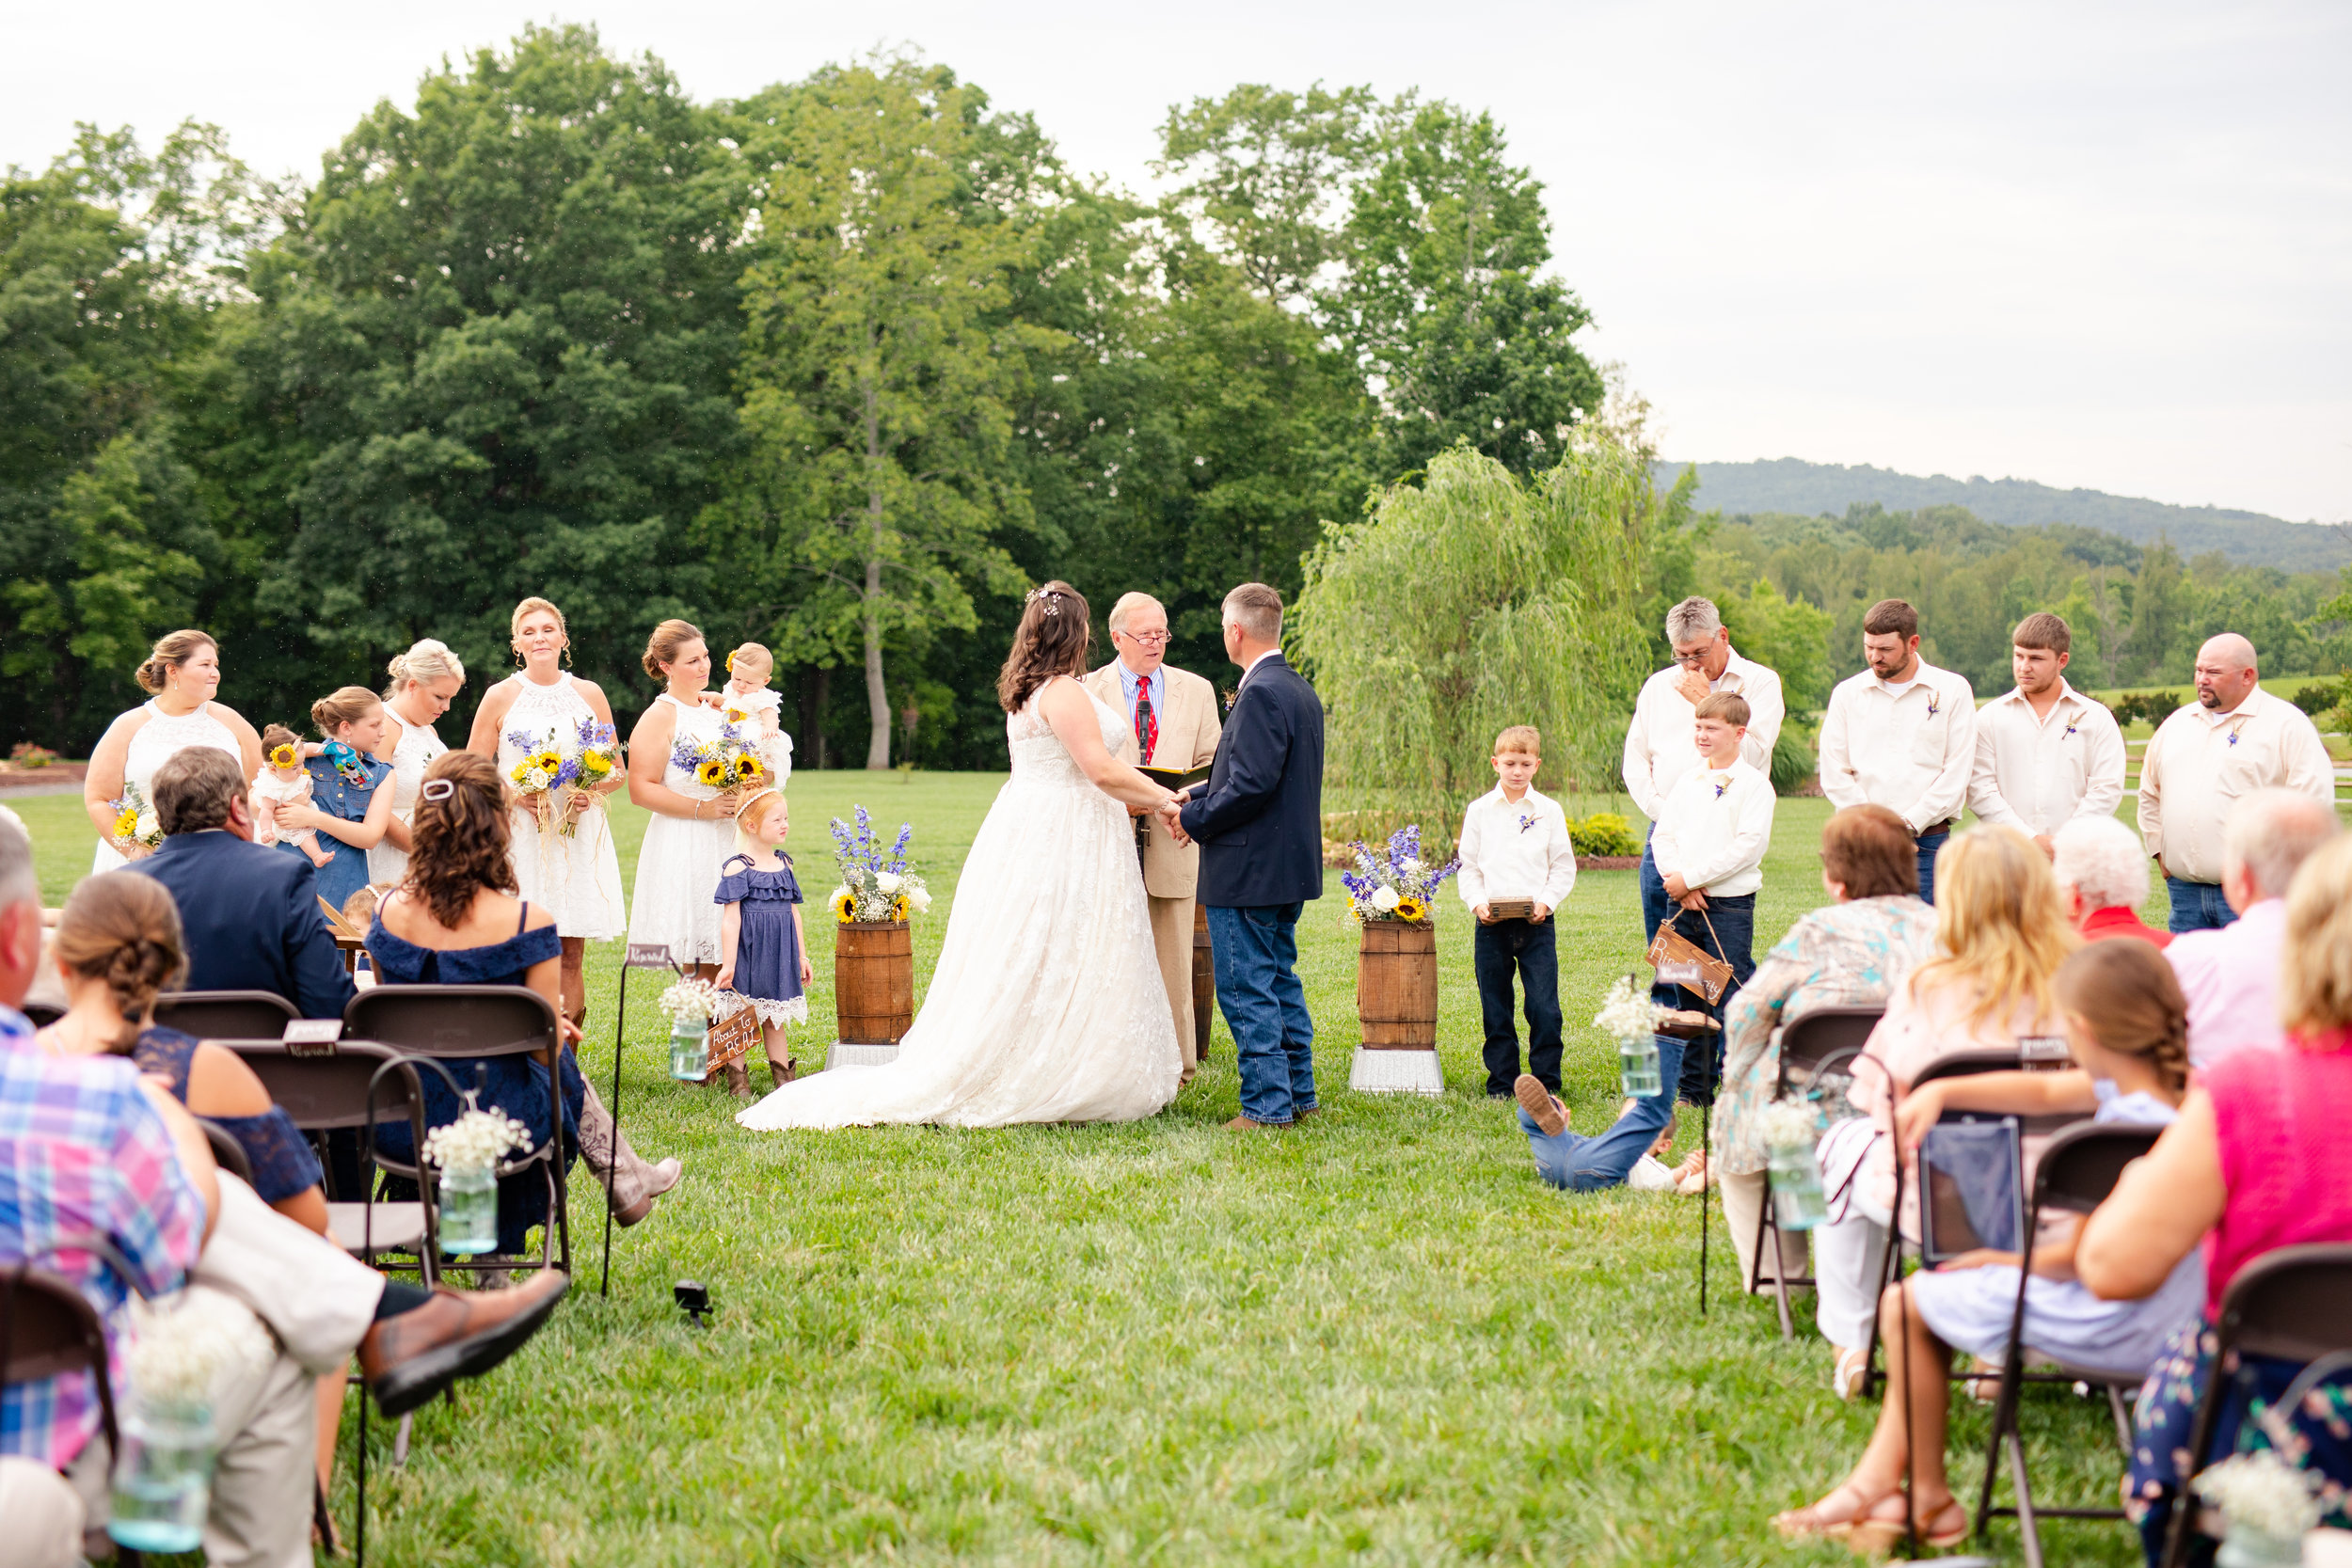 _Keving & Danielle Wedding_20502.JPG